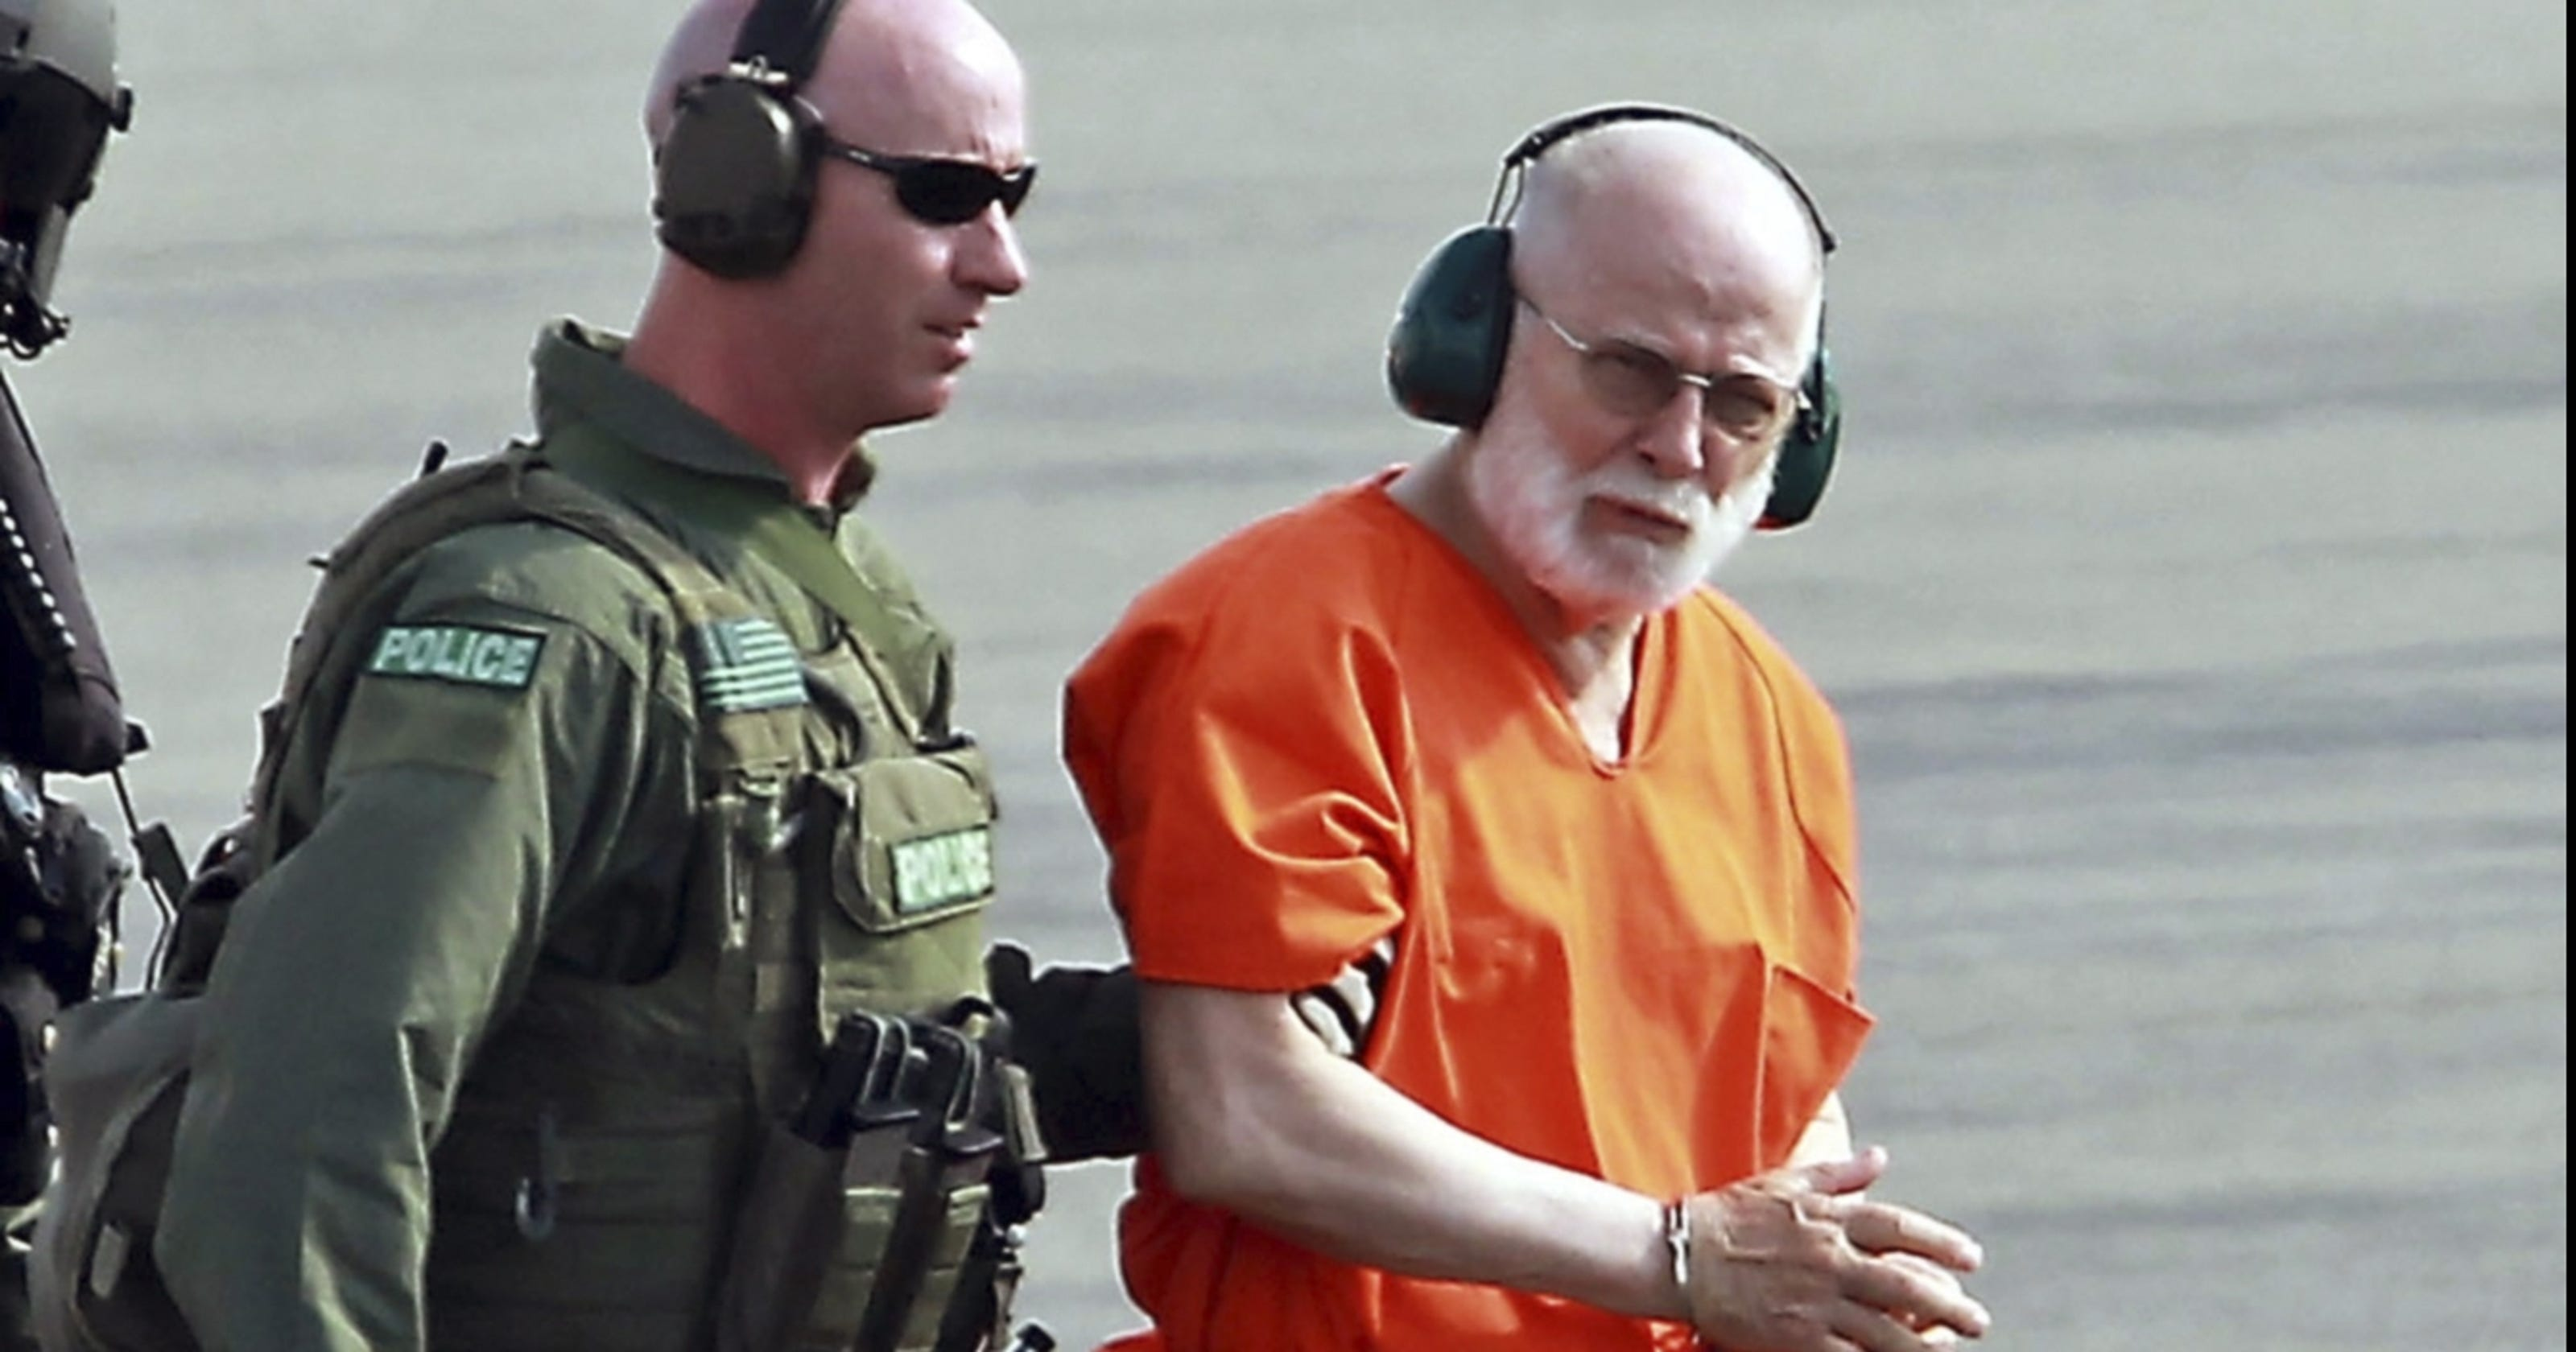 Top enforcement agencies don't track crimes by informants